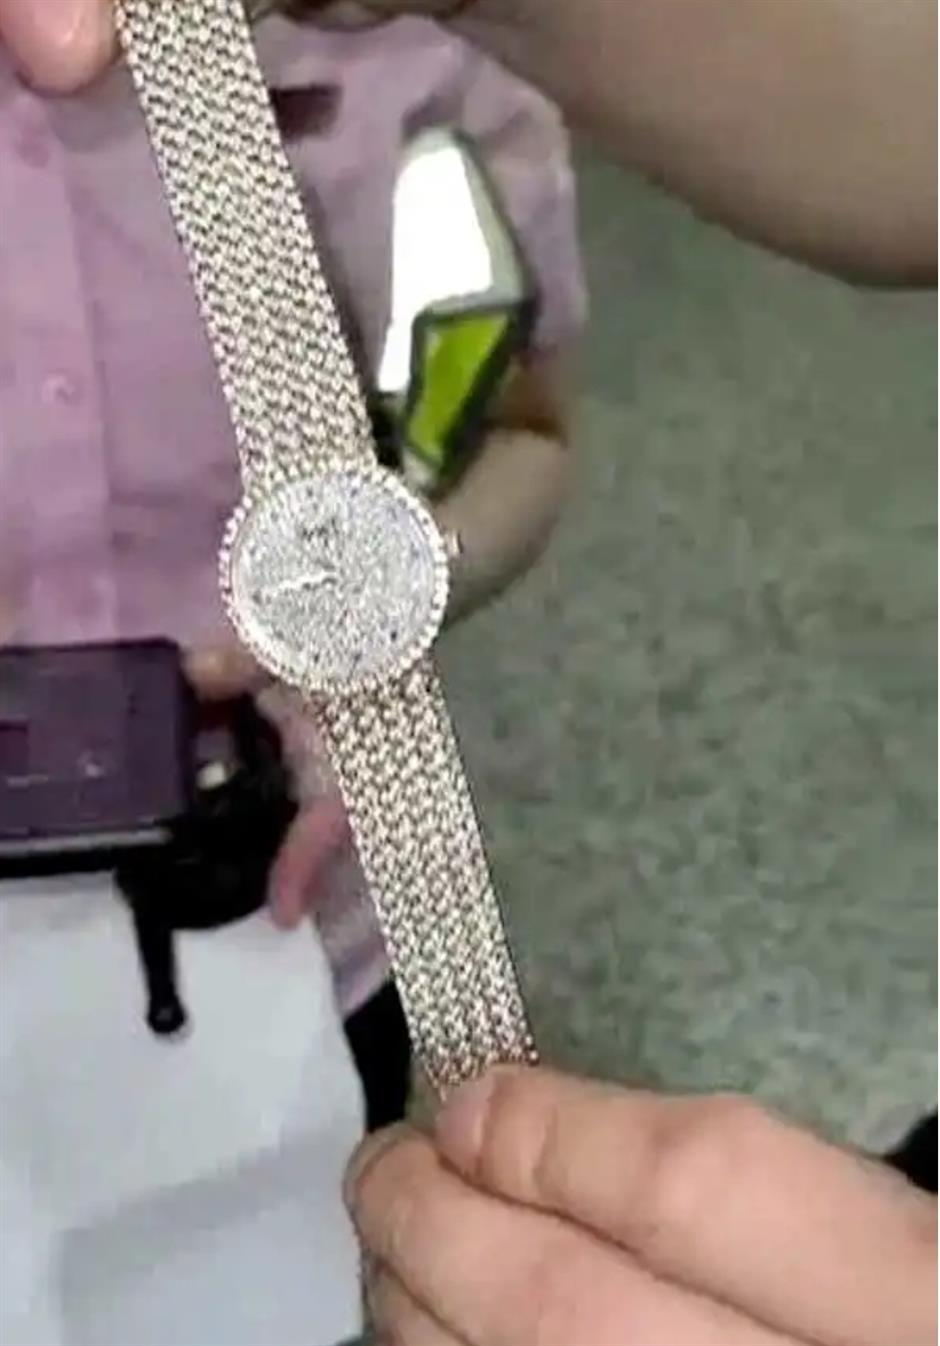 Metro passenger's 700,000-yuan luxurious watch recovered